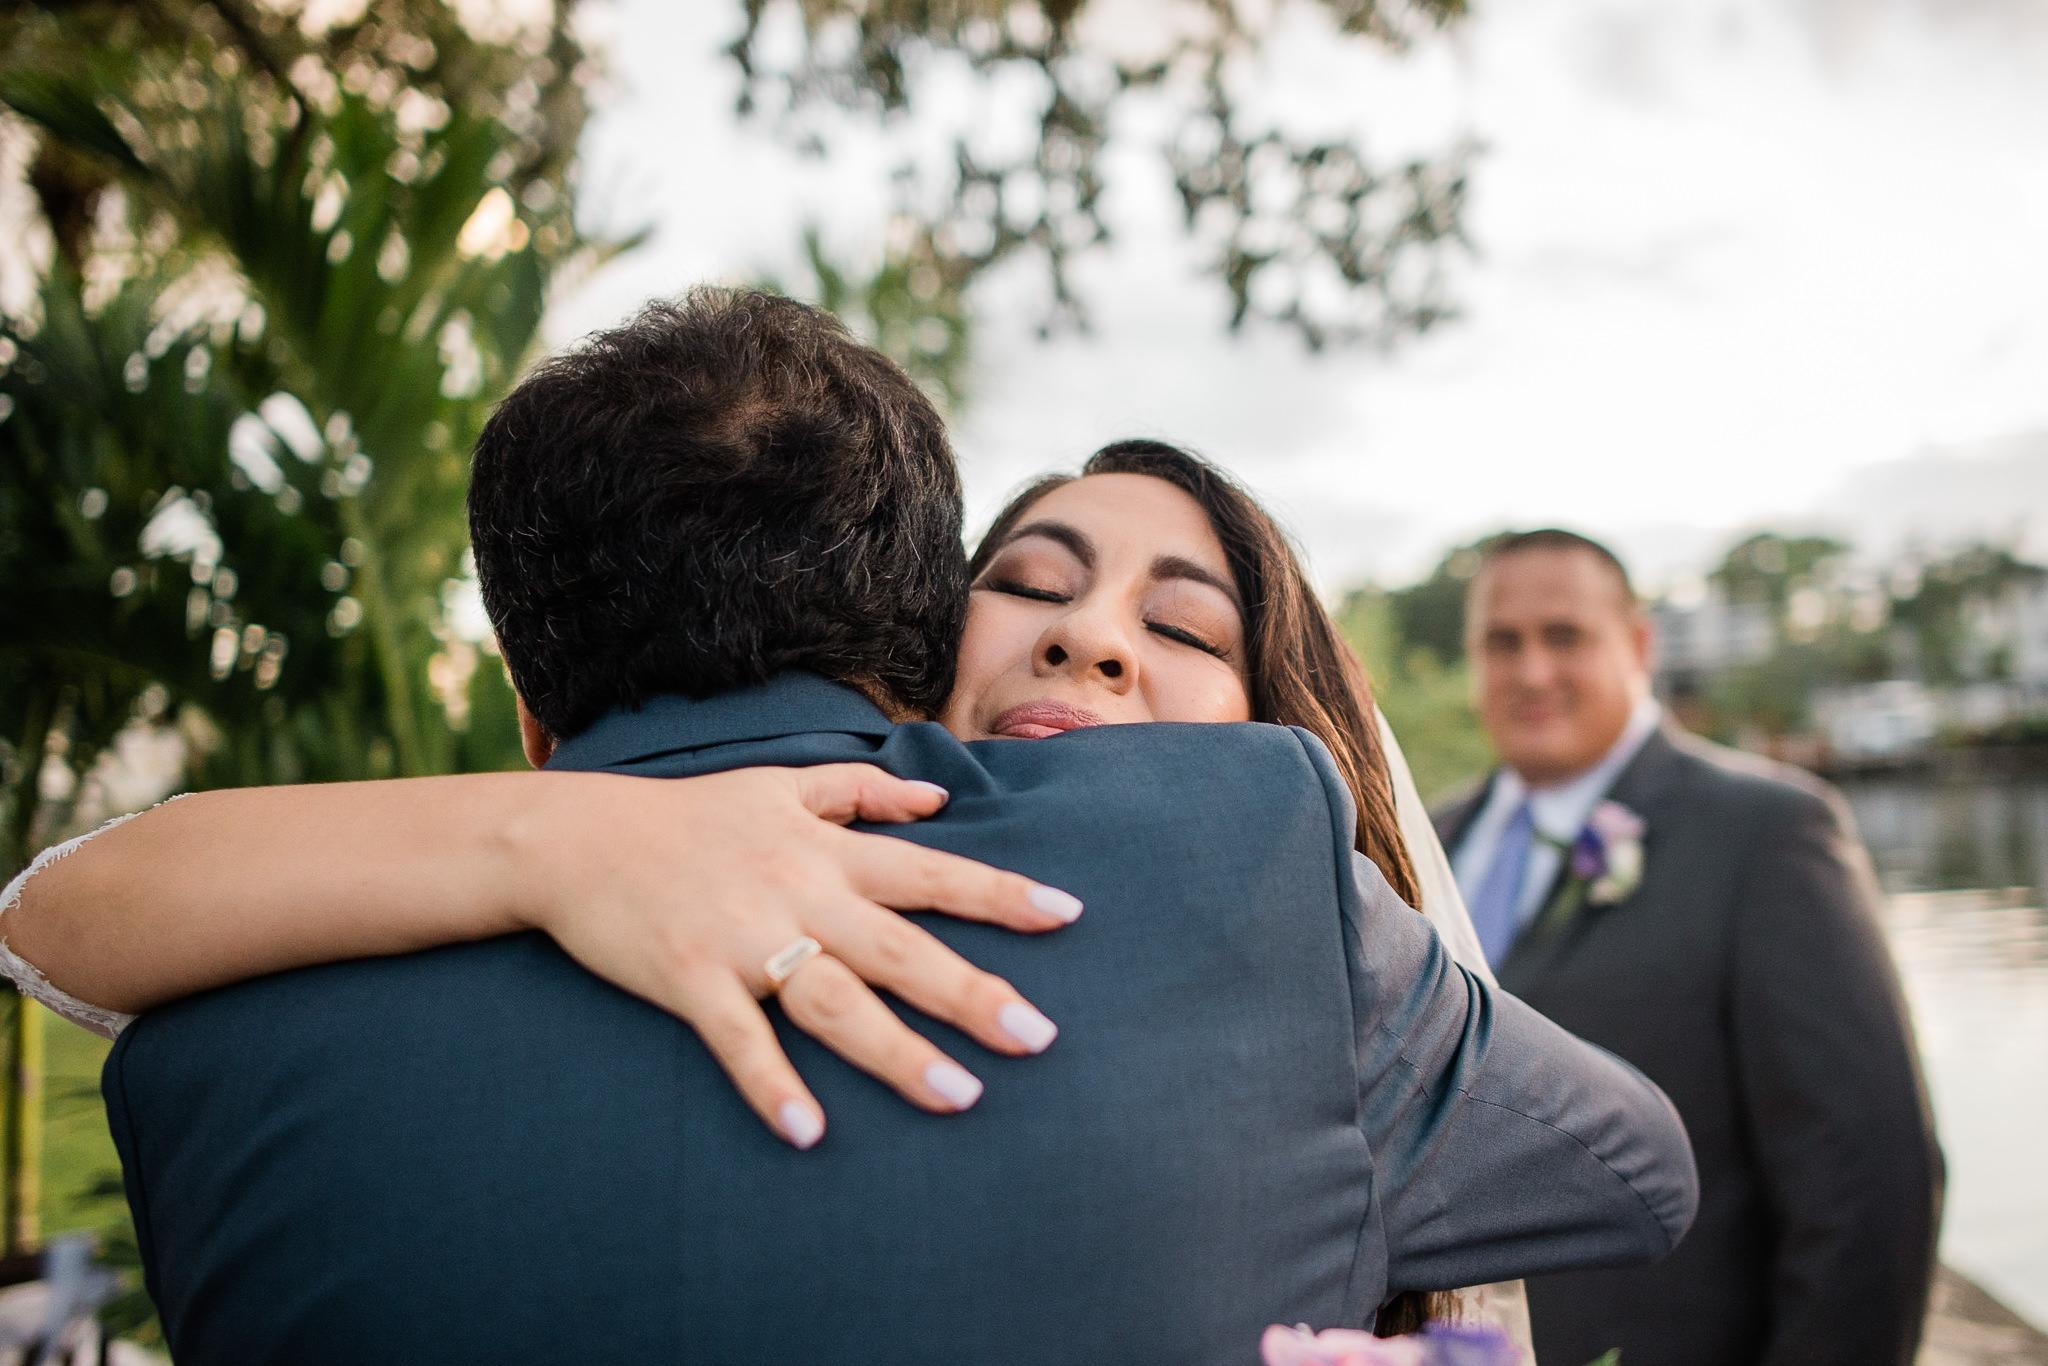 TAMPA_WEDDING_PHOTOGRAPHER_AAMZ_4400.jpg